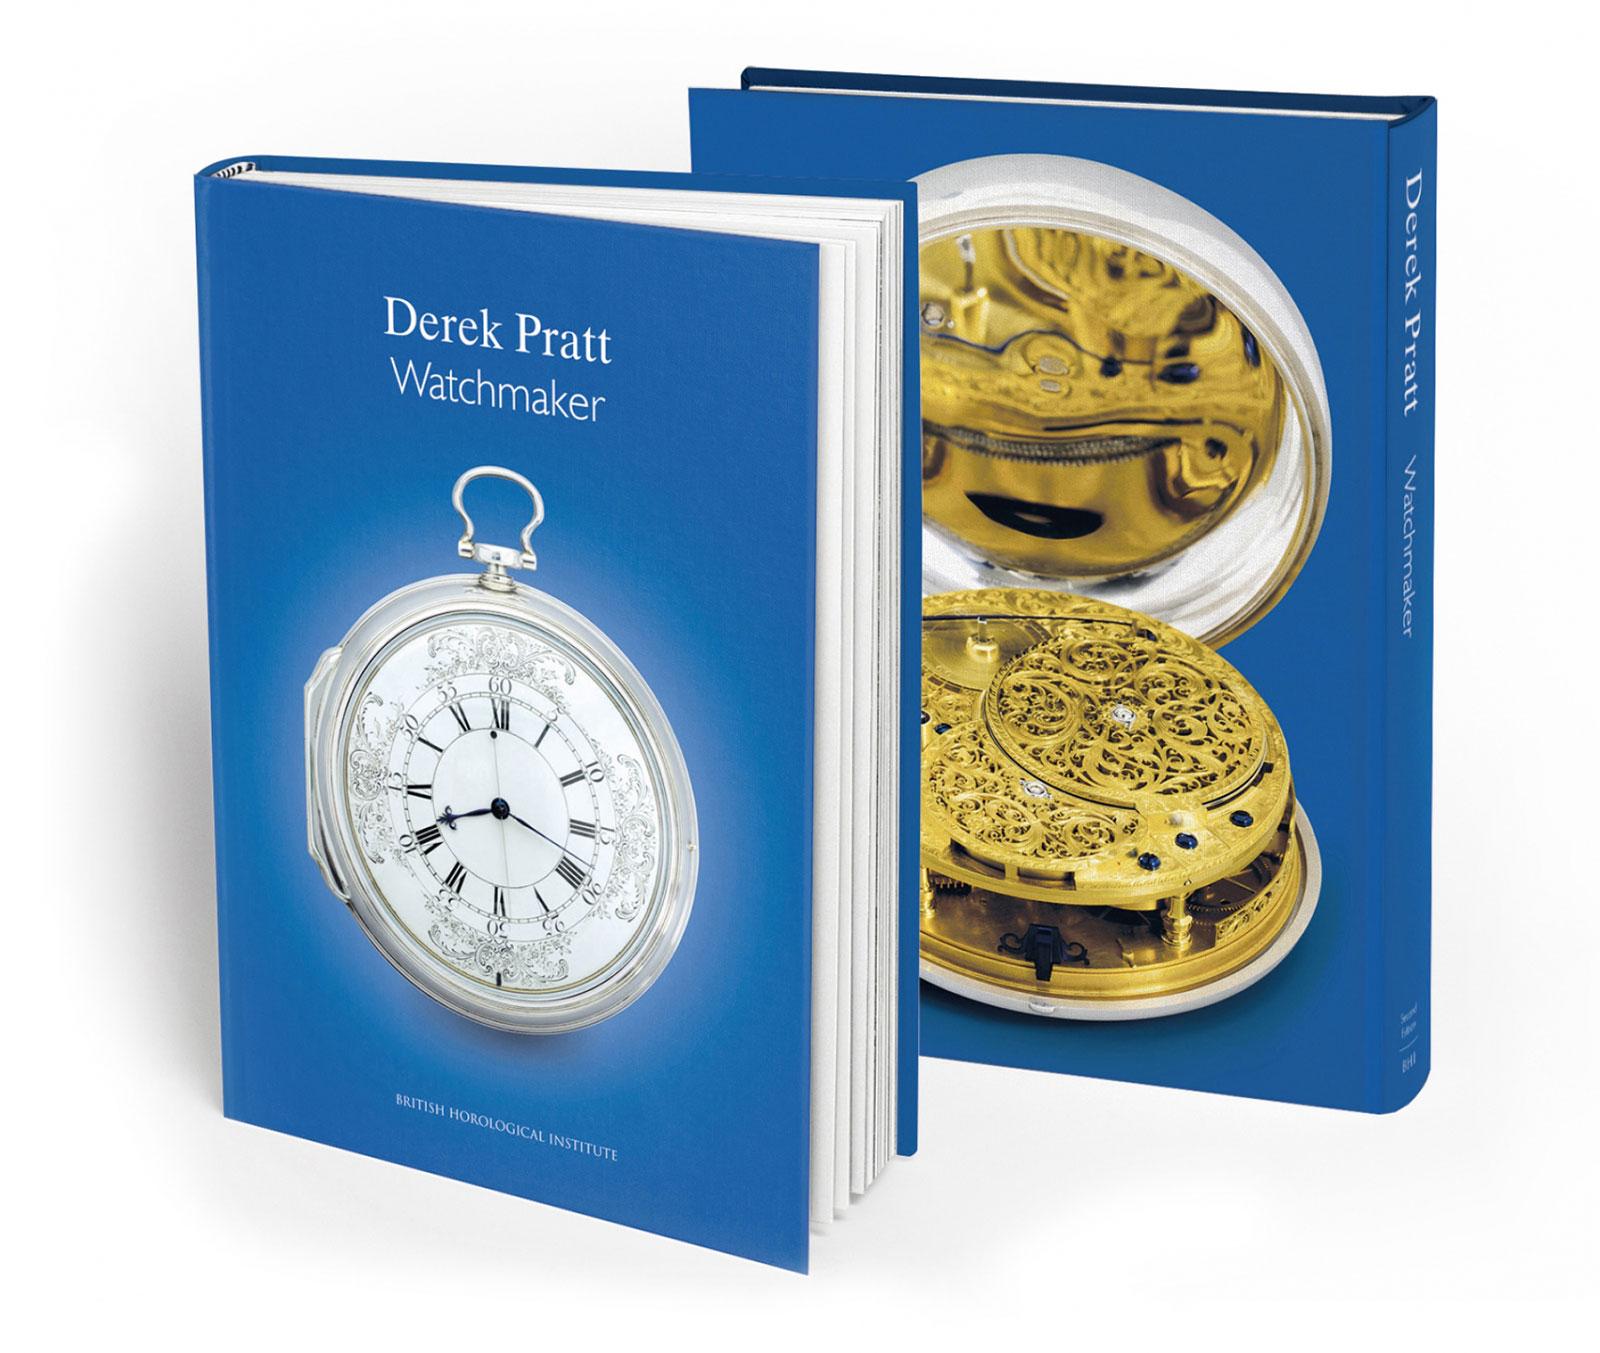 Derek-Pratt-Watchmaker-Book-BHI